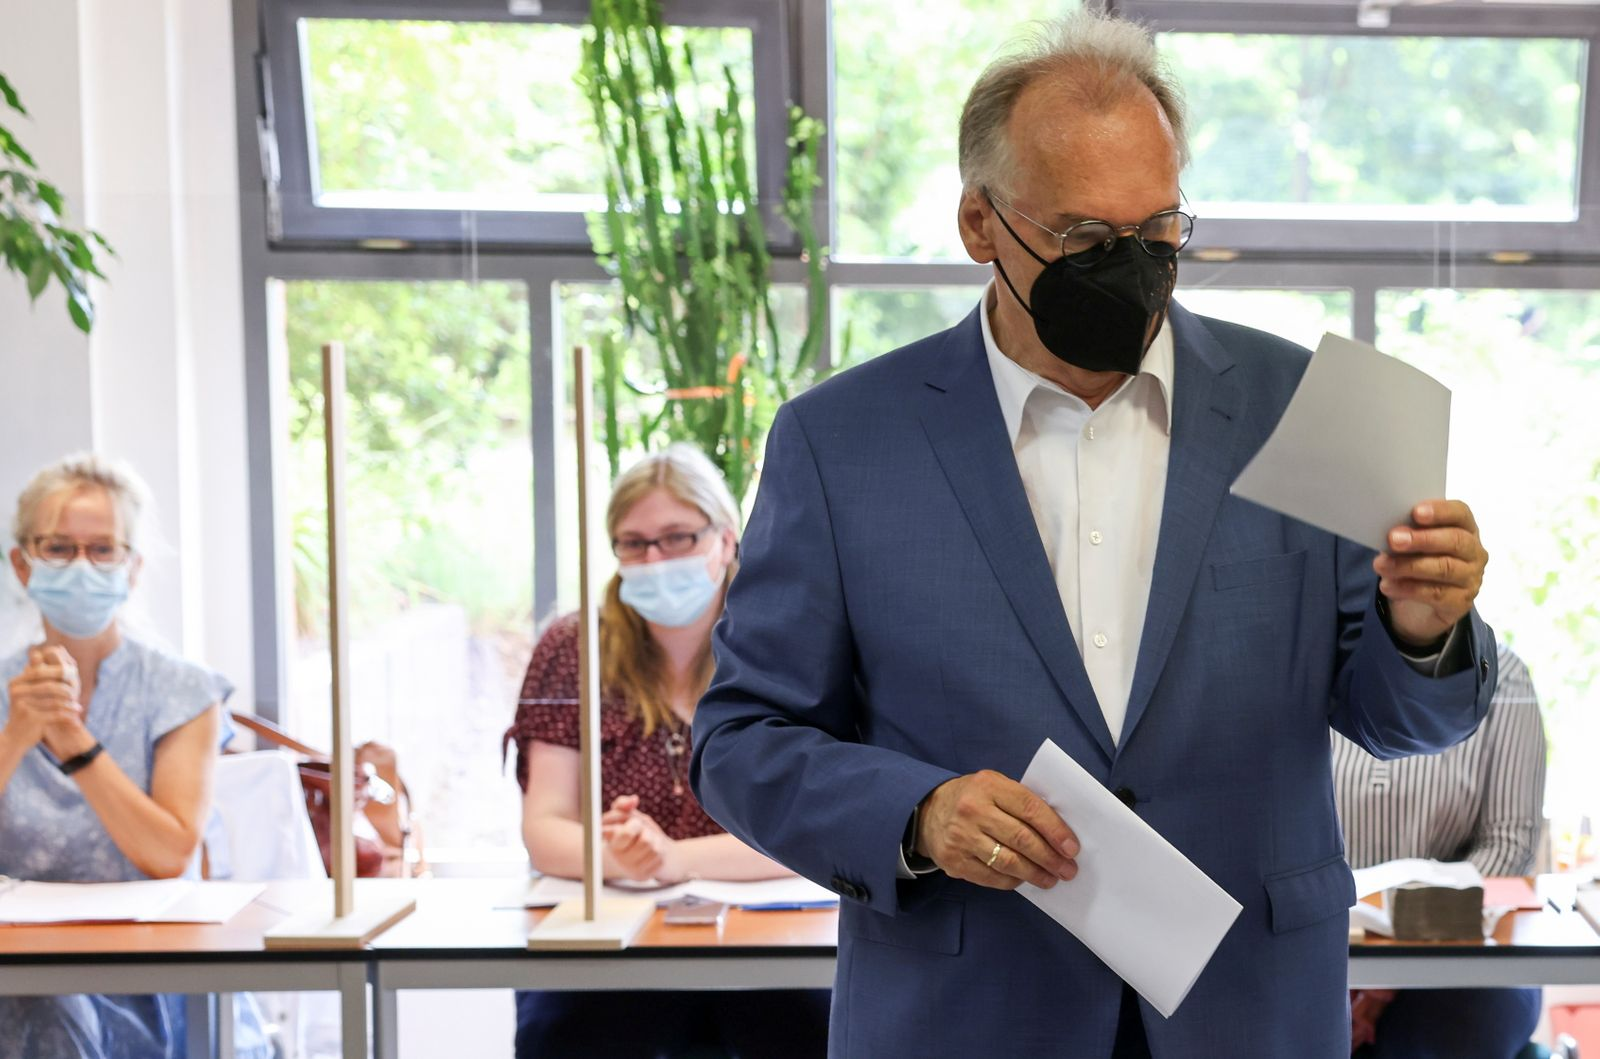 Saxony-Anhalt state election